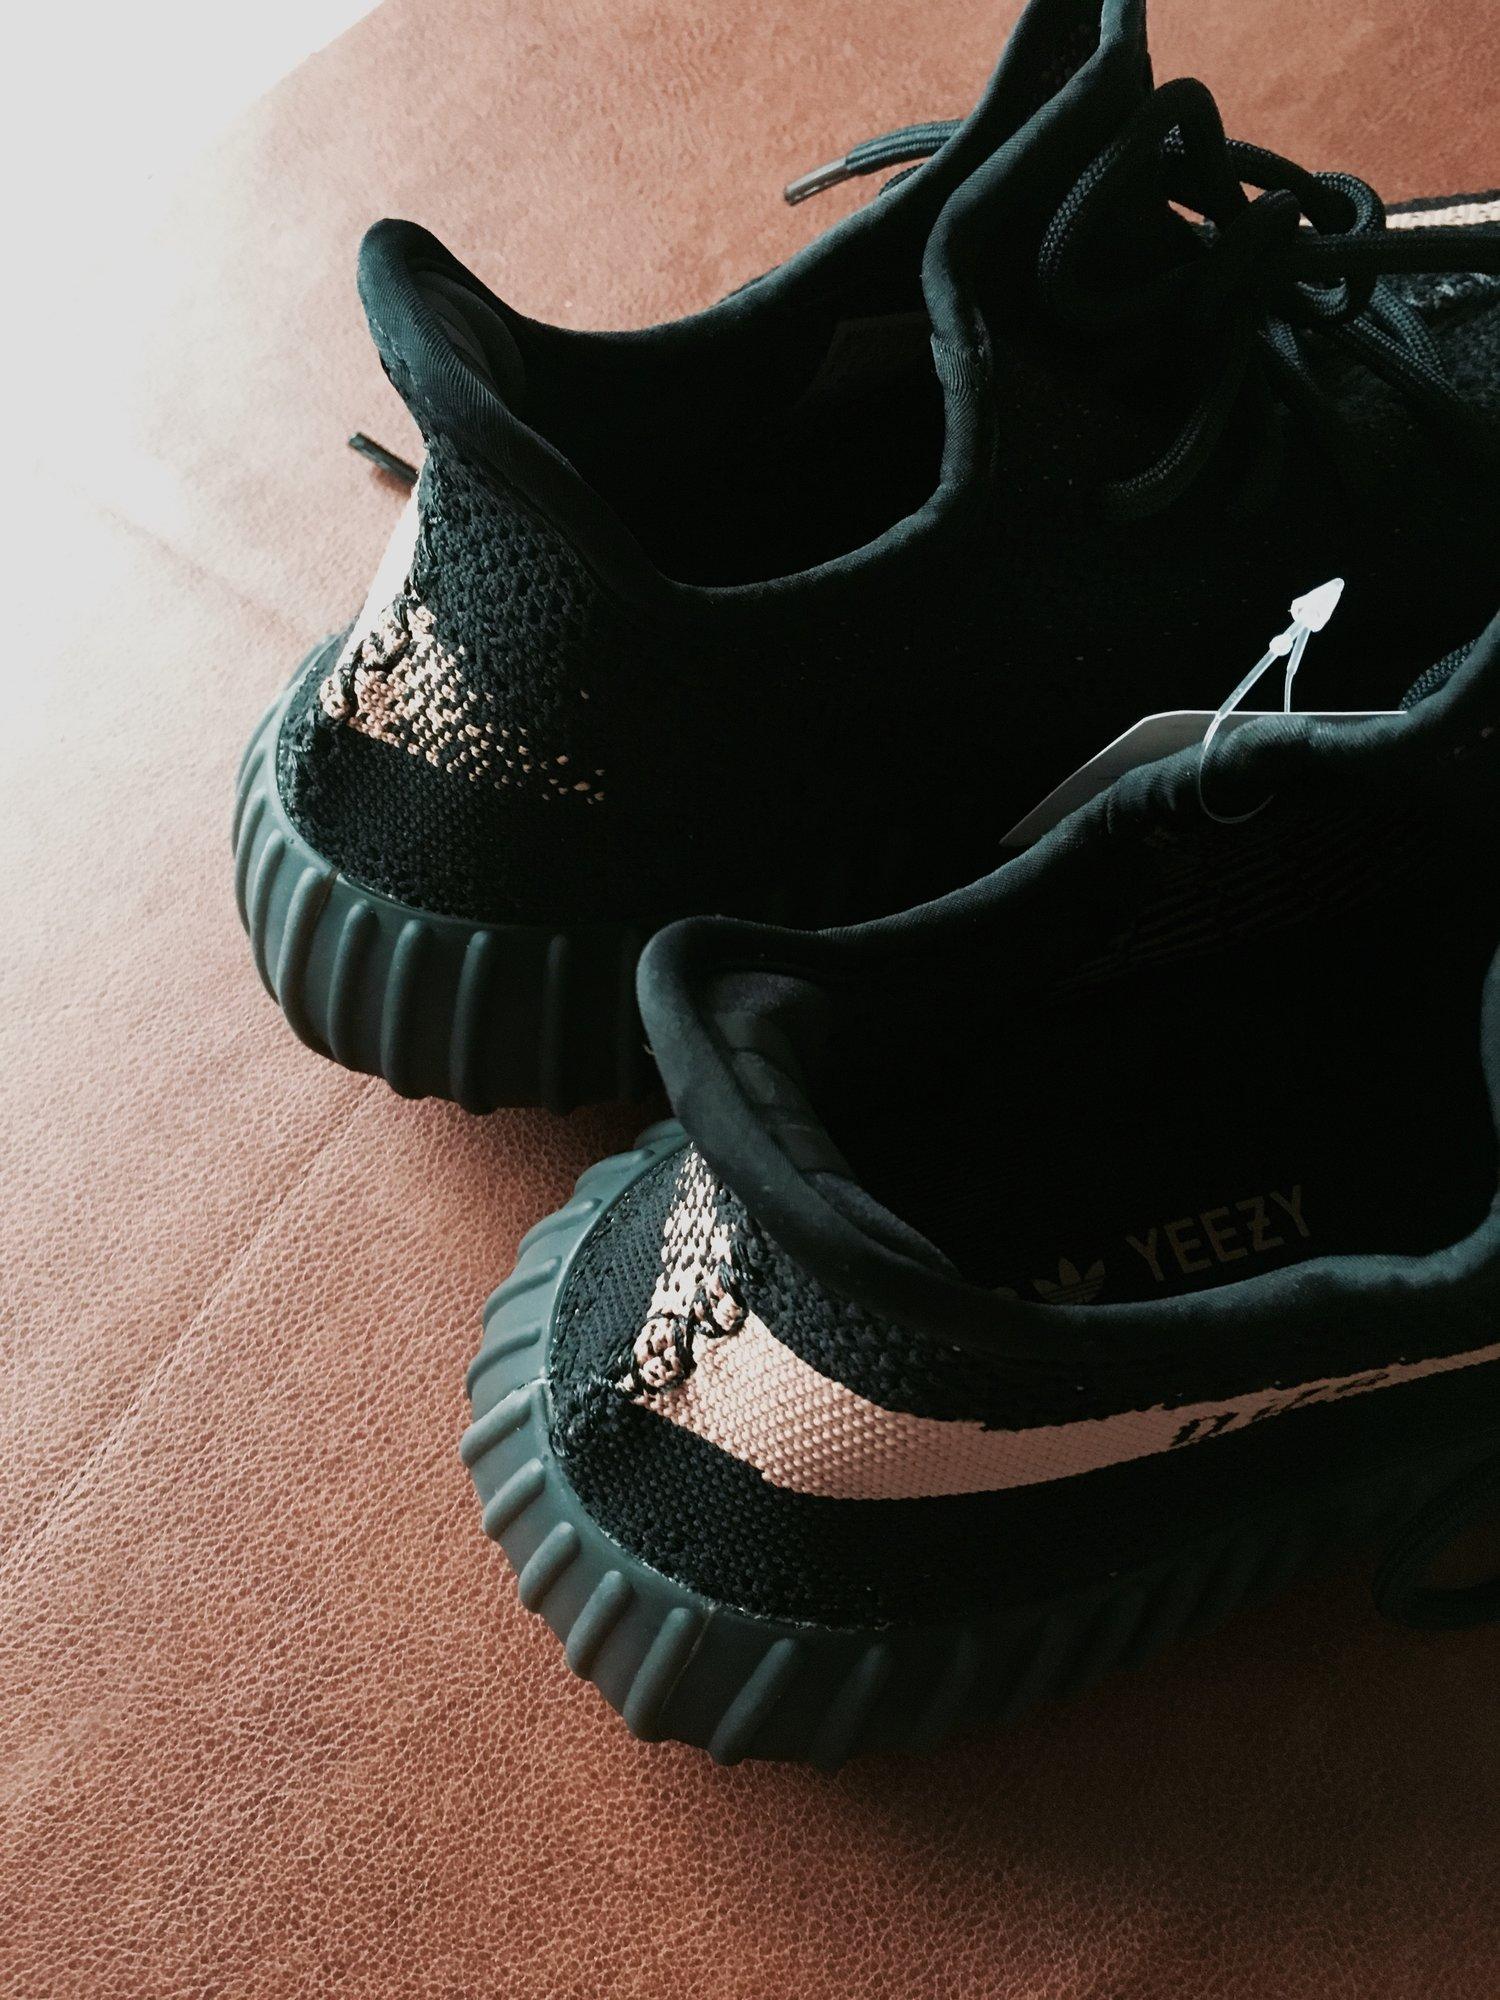 Adidas-Yeezy-V2-CreativeSession-Copper-Closeup-Back